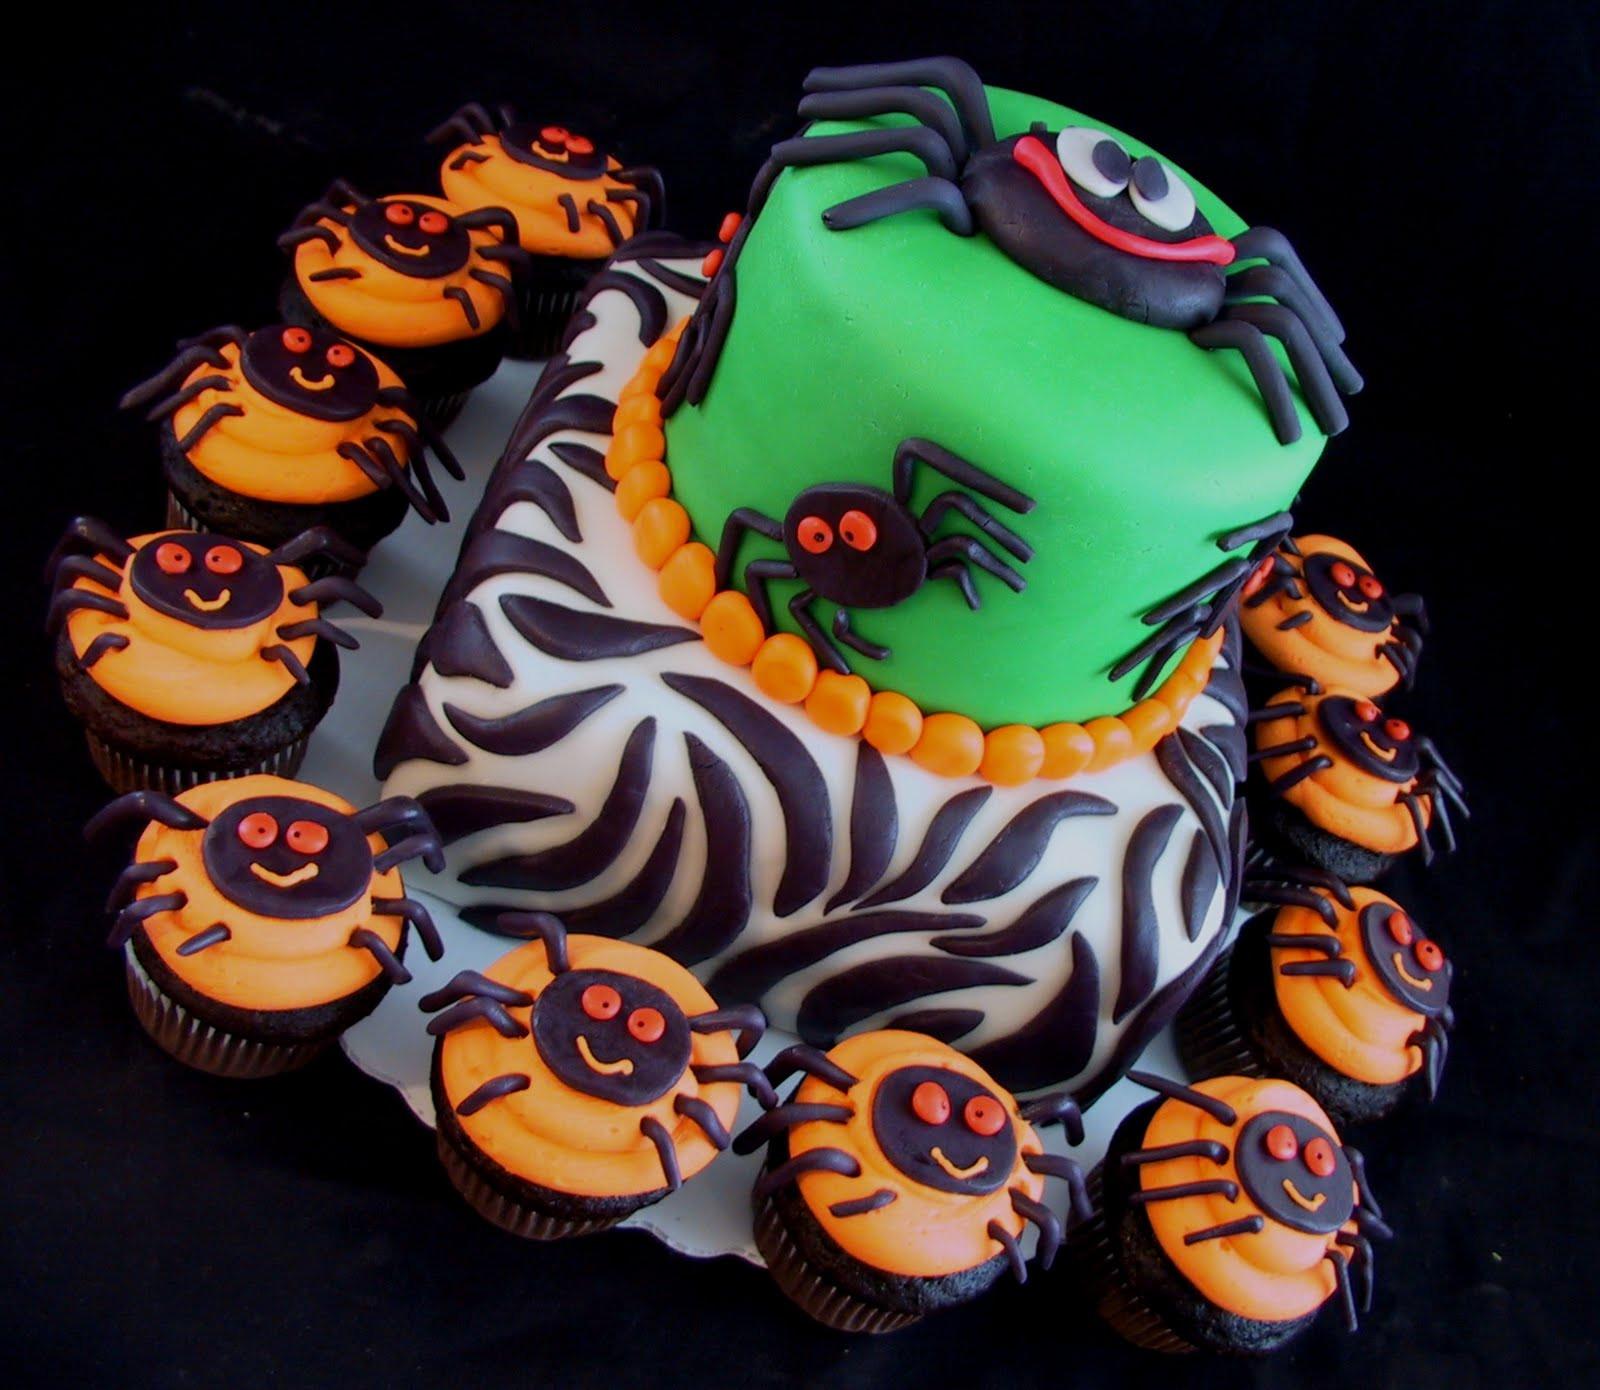 Halloween Cupcakes Cake  Birthday Cake Center Halloween Birthday Cakes 2011